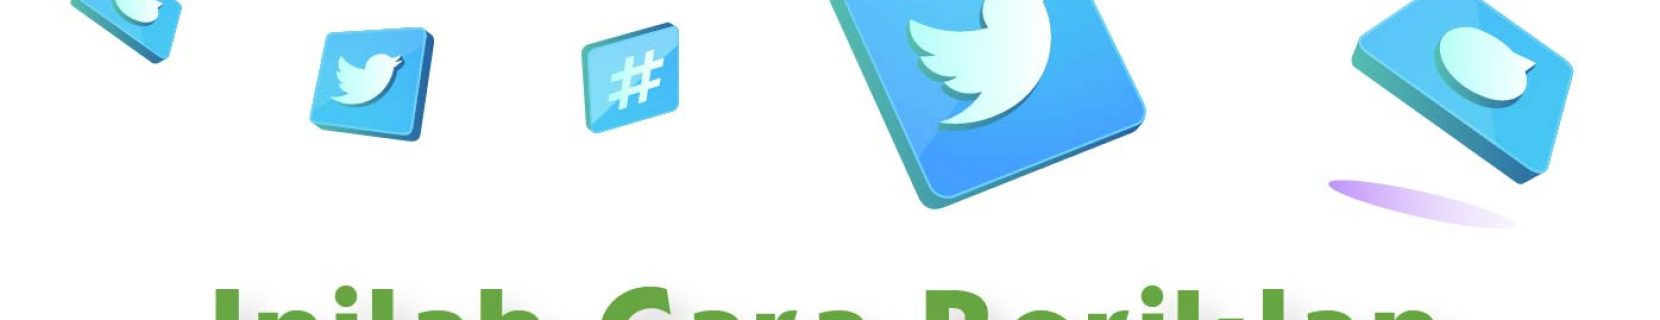 Cara Beriklan di Twitter dengan Mudah, Ini 4 Langkahny